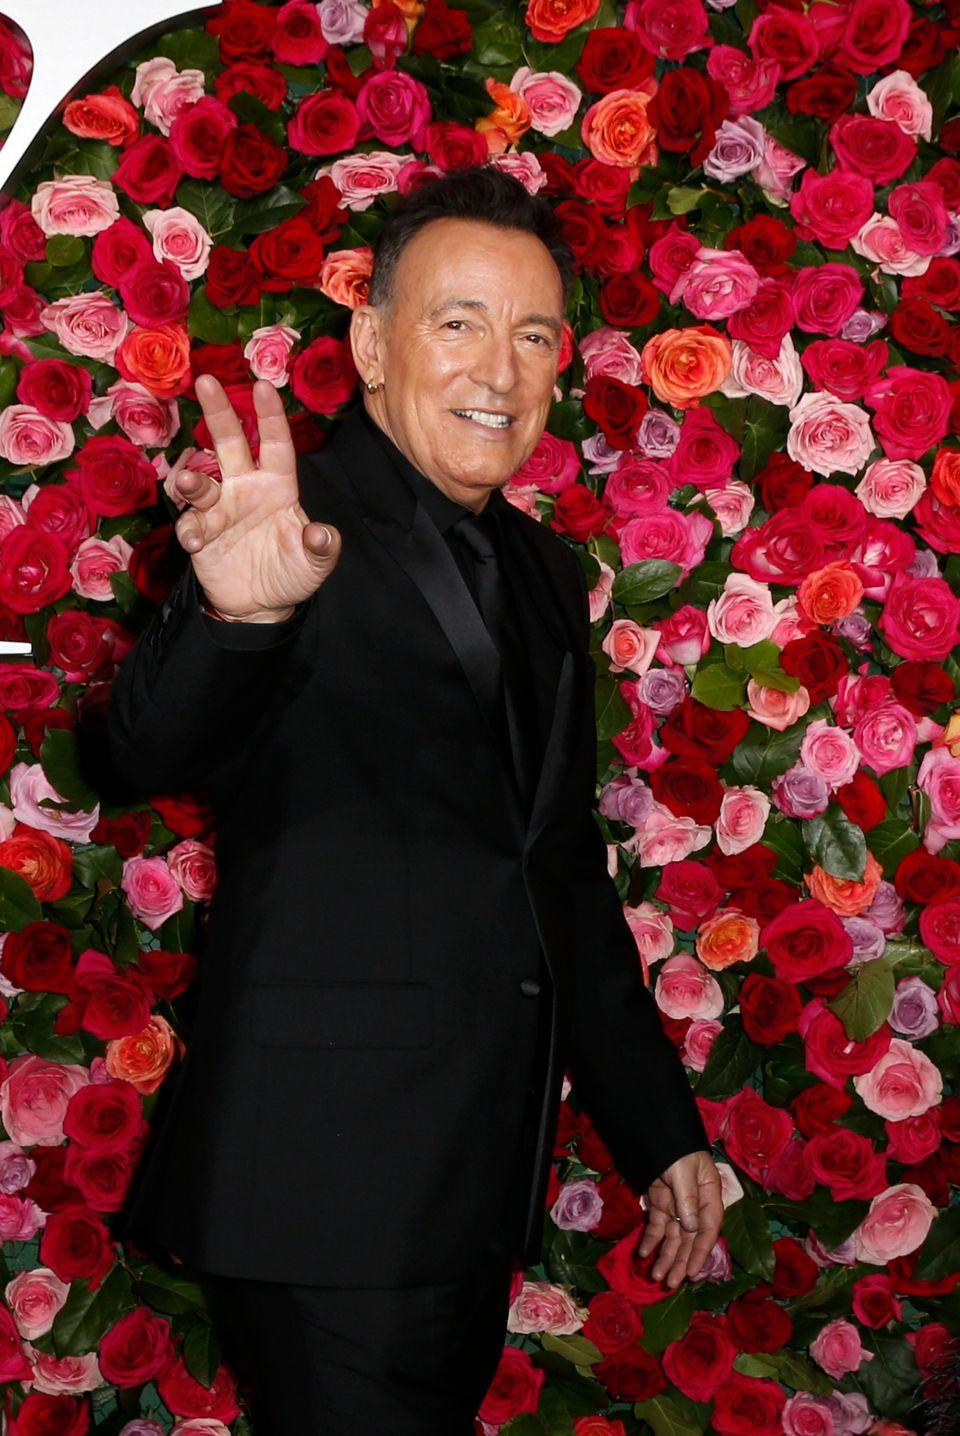 Tony Awards: Η μεγάλη γιορτή του Broadway, οι νικητές, τα πολιτικά σχόλια και οι εμφανίσεις στο κόκκινο